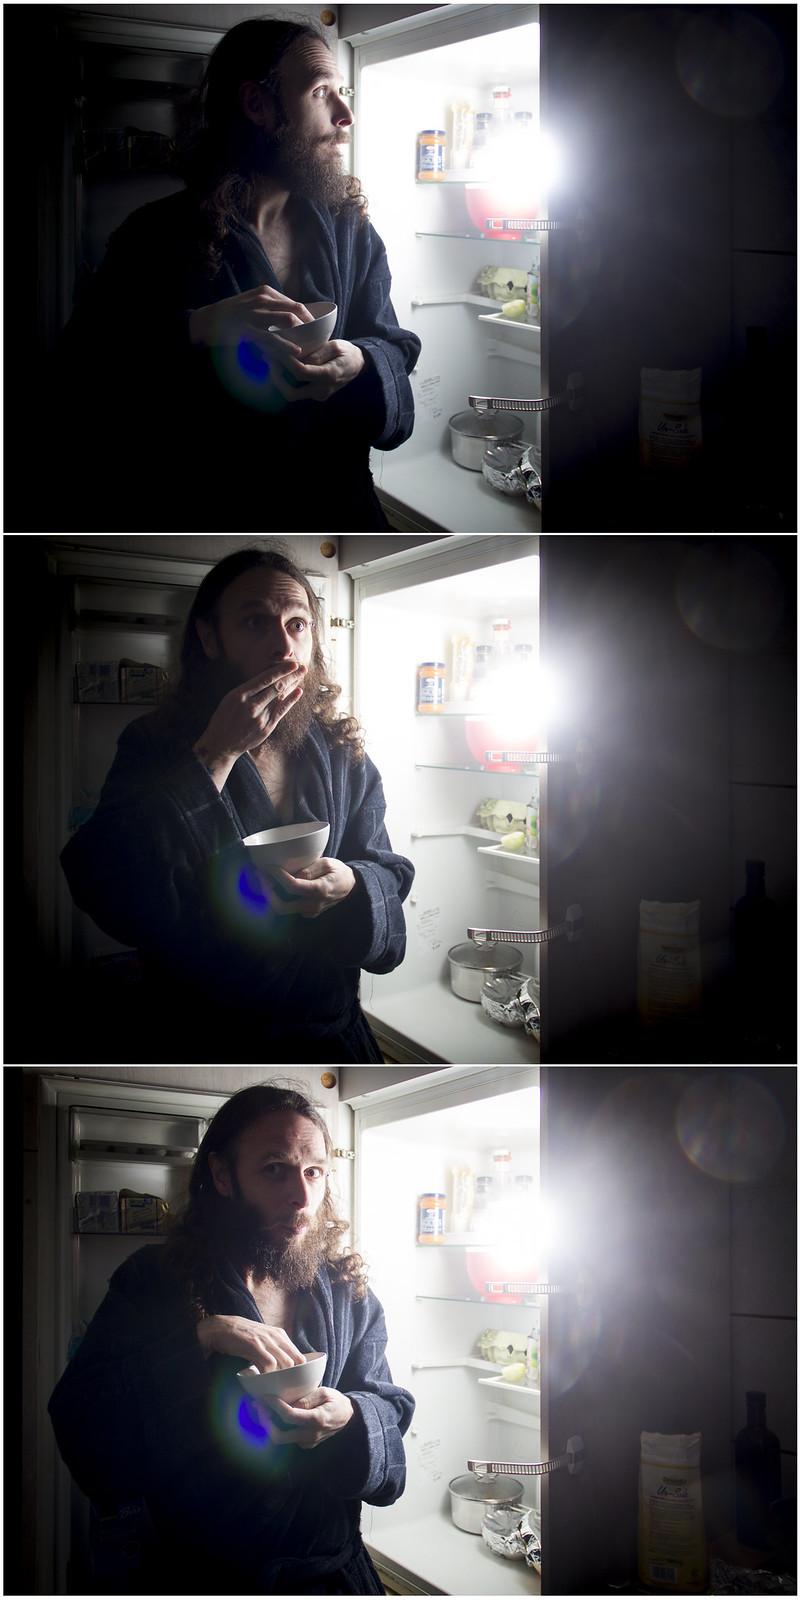 30.01.2015 Midnight Snack